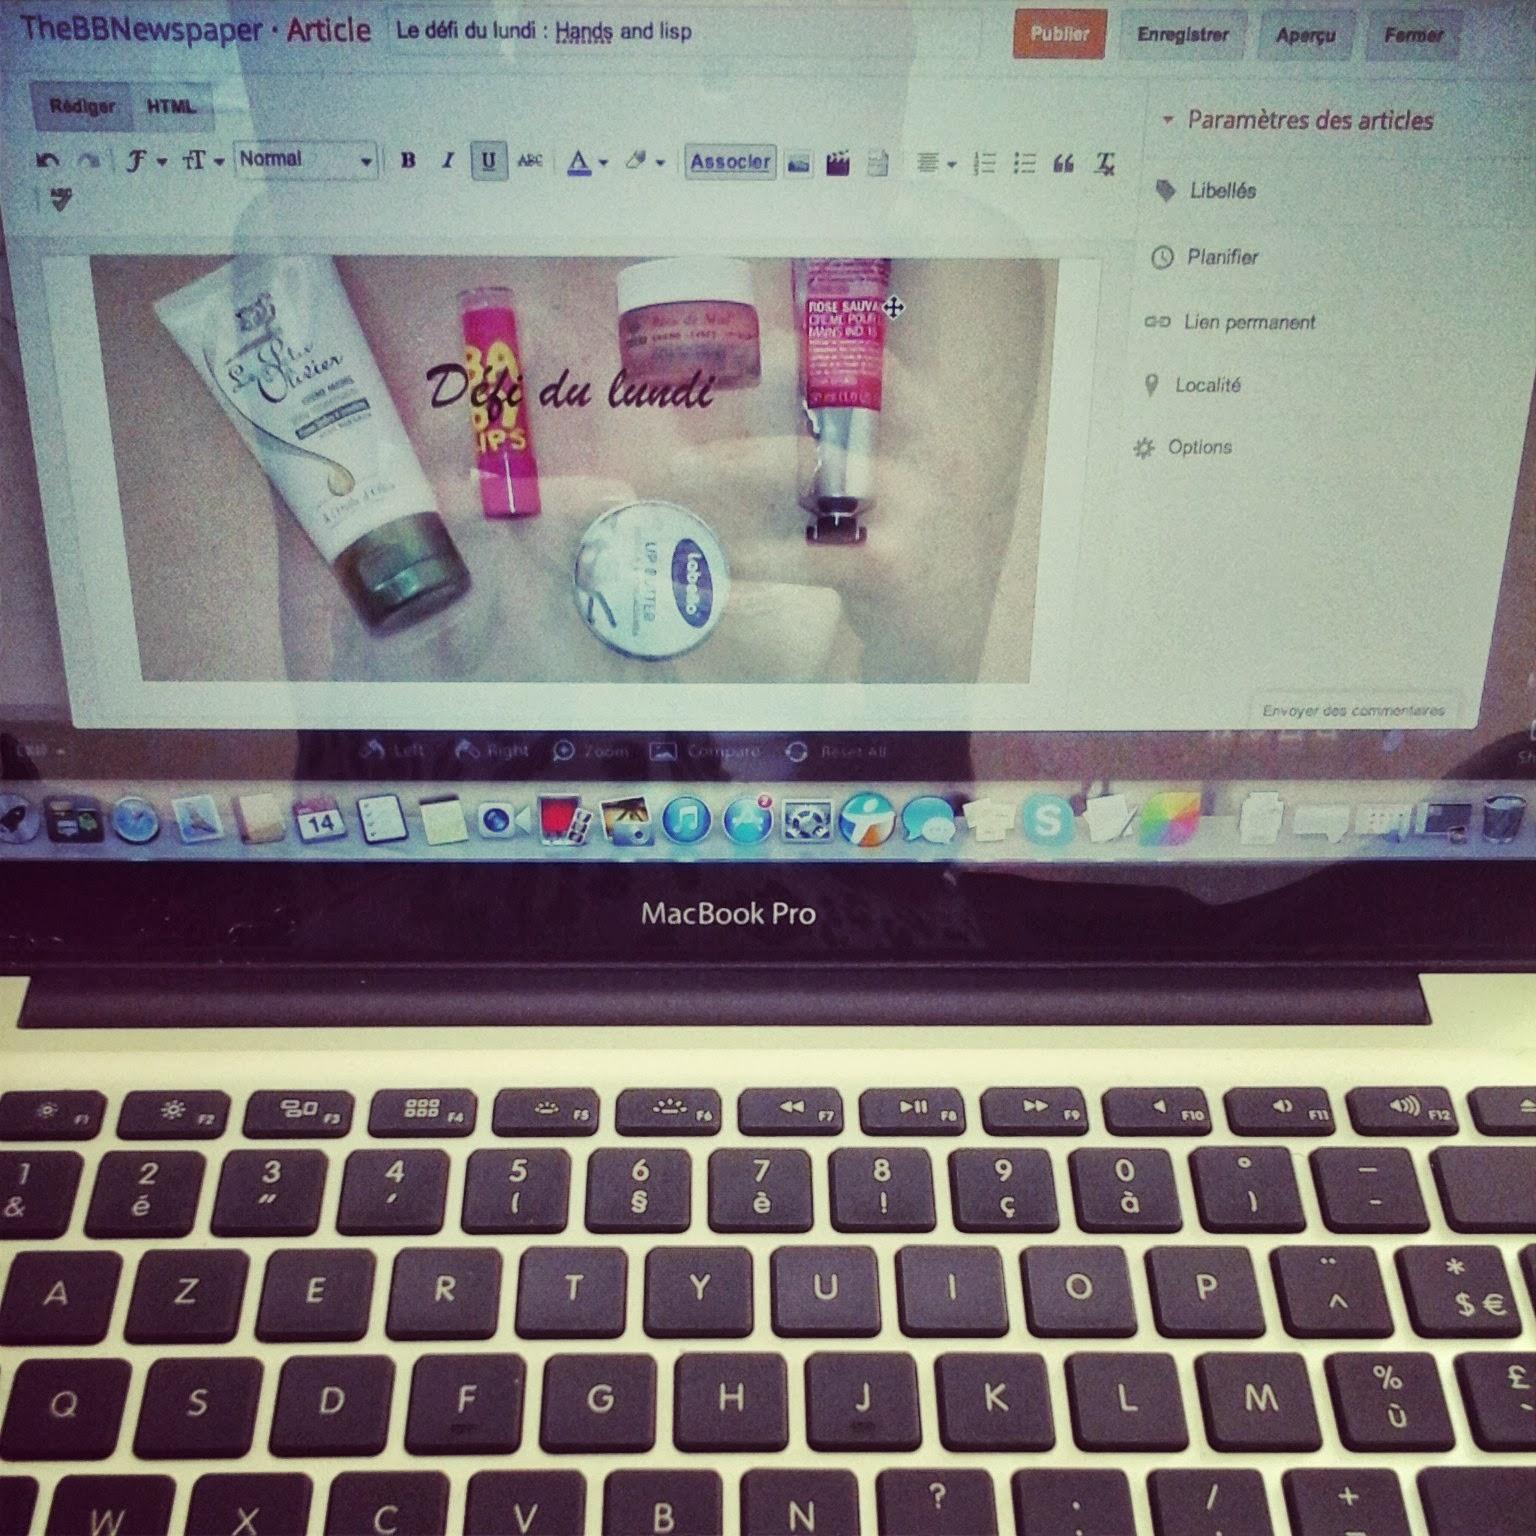 TheBBNewspaper︱Blog beauté: #Instagram, une semaine